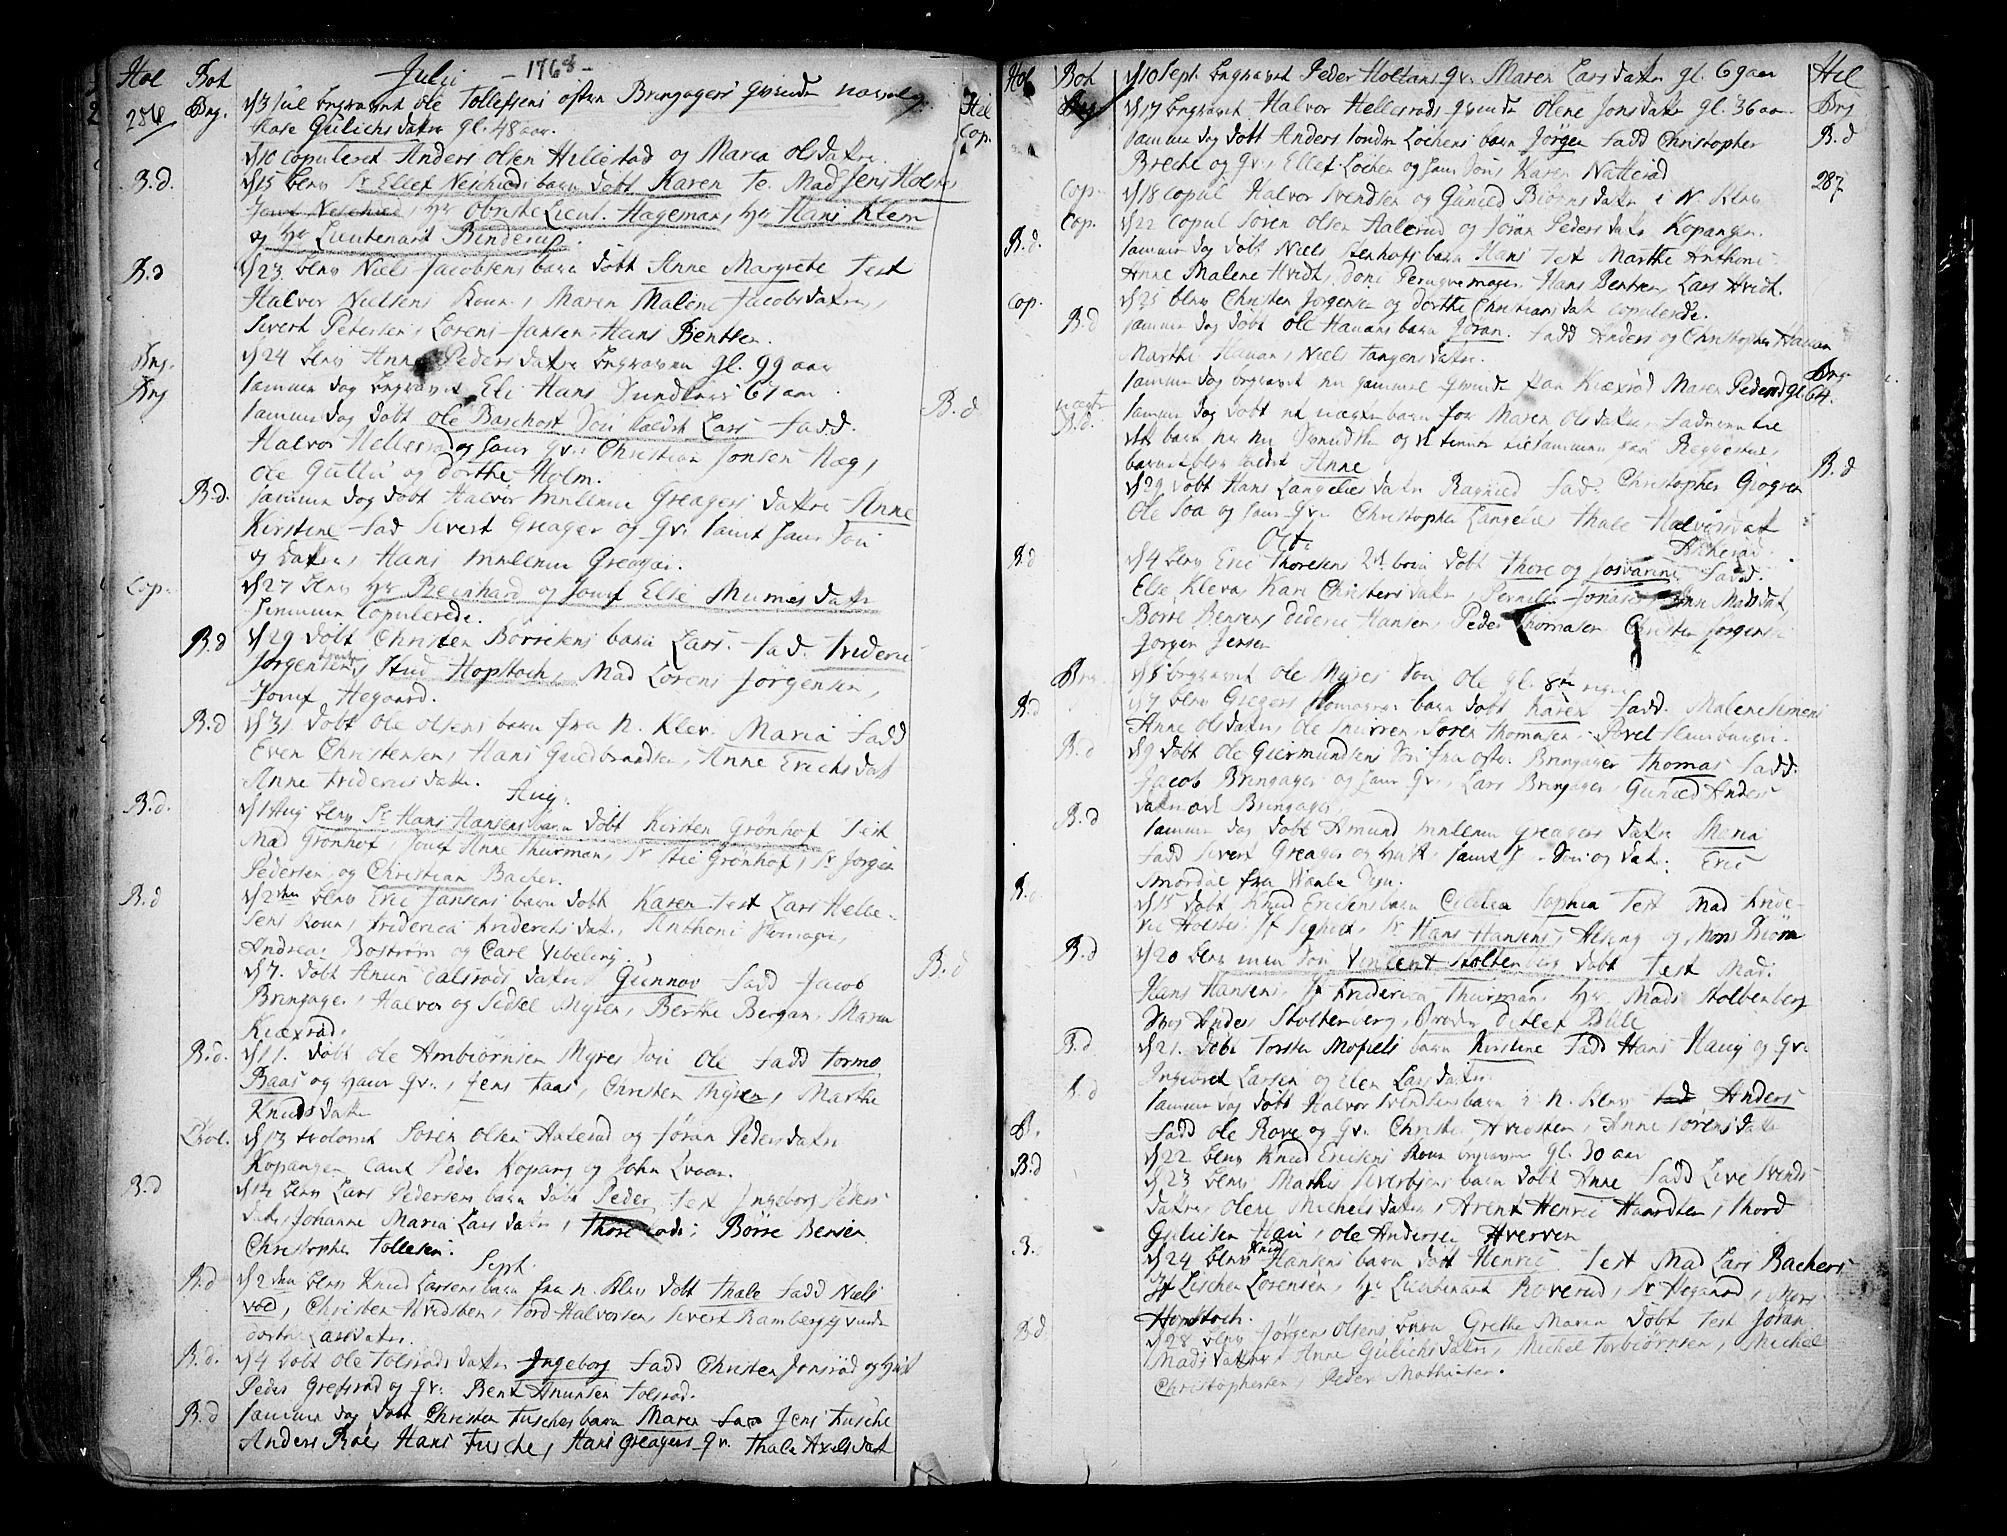 SAKO, Botne kirkebøker, F/Fa/L0001a: Ministerialbok nr. I 1A, 1707-1778, s. 286-287